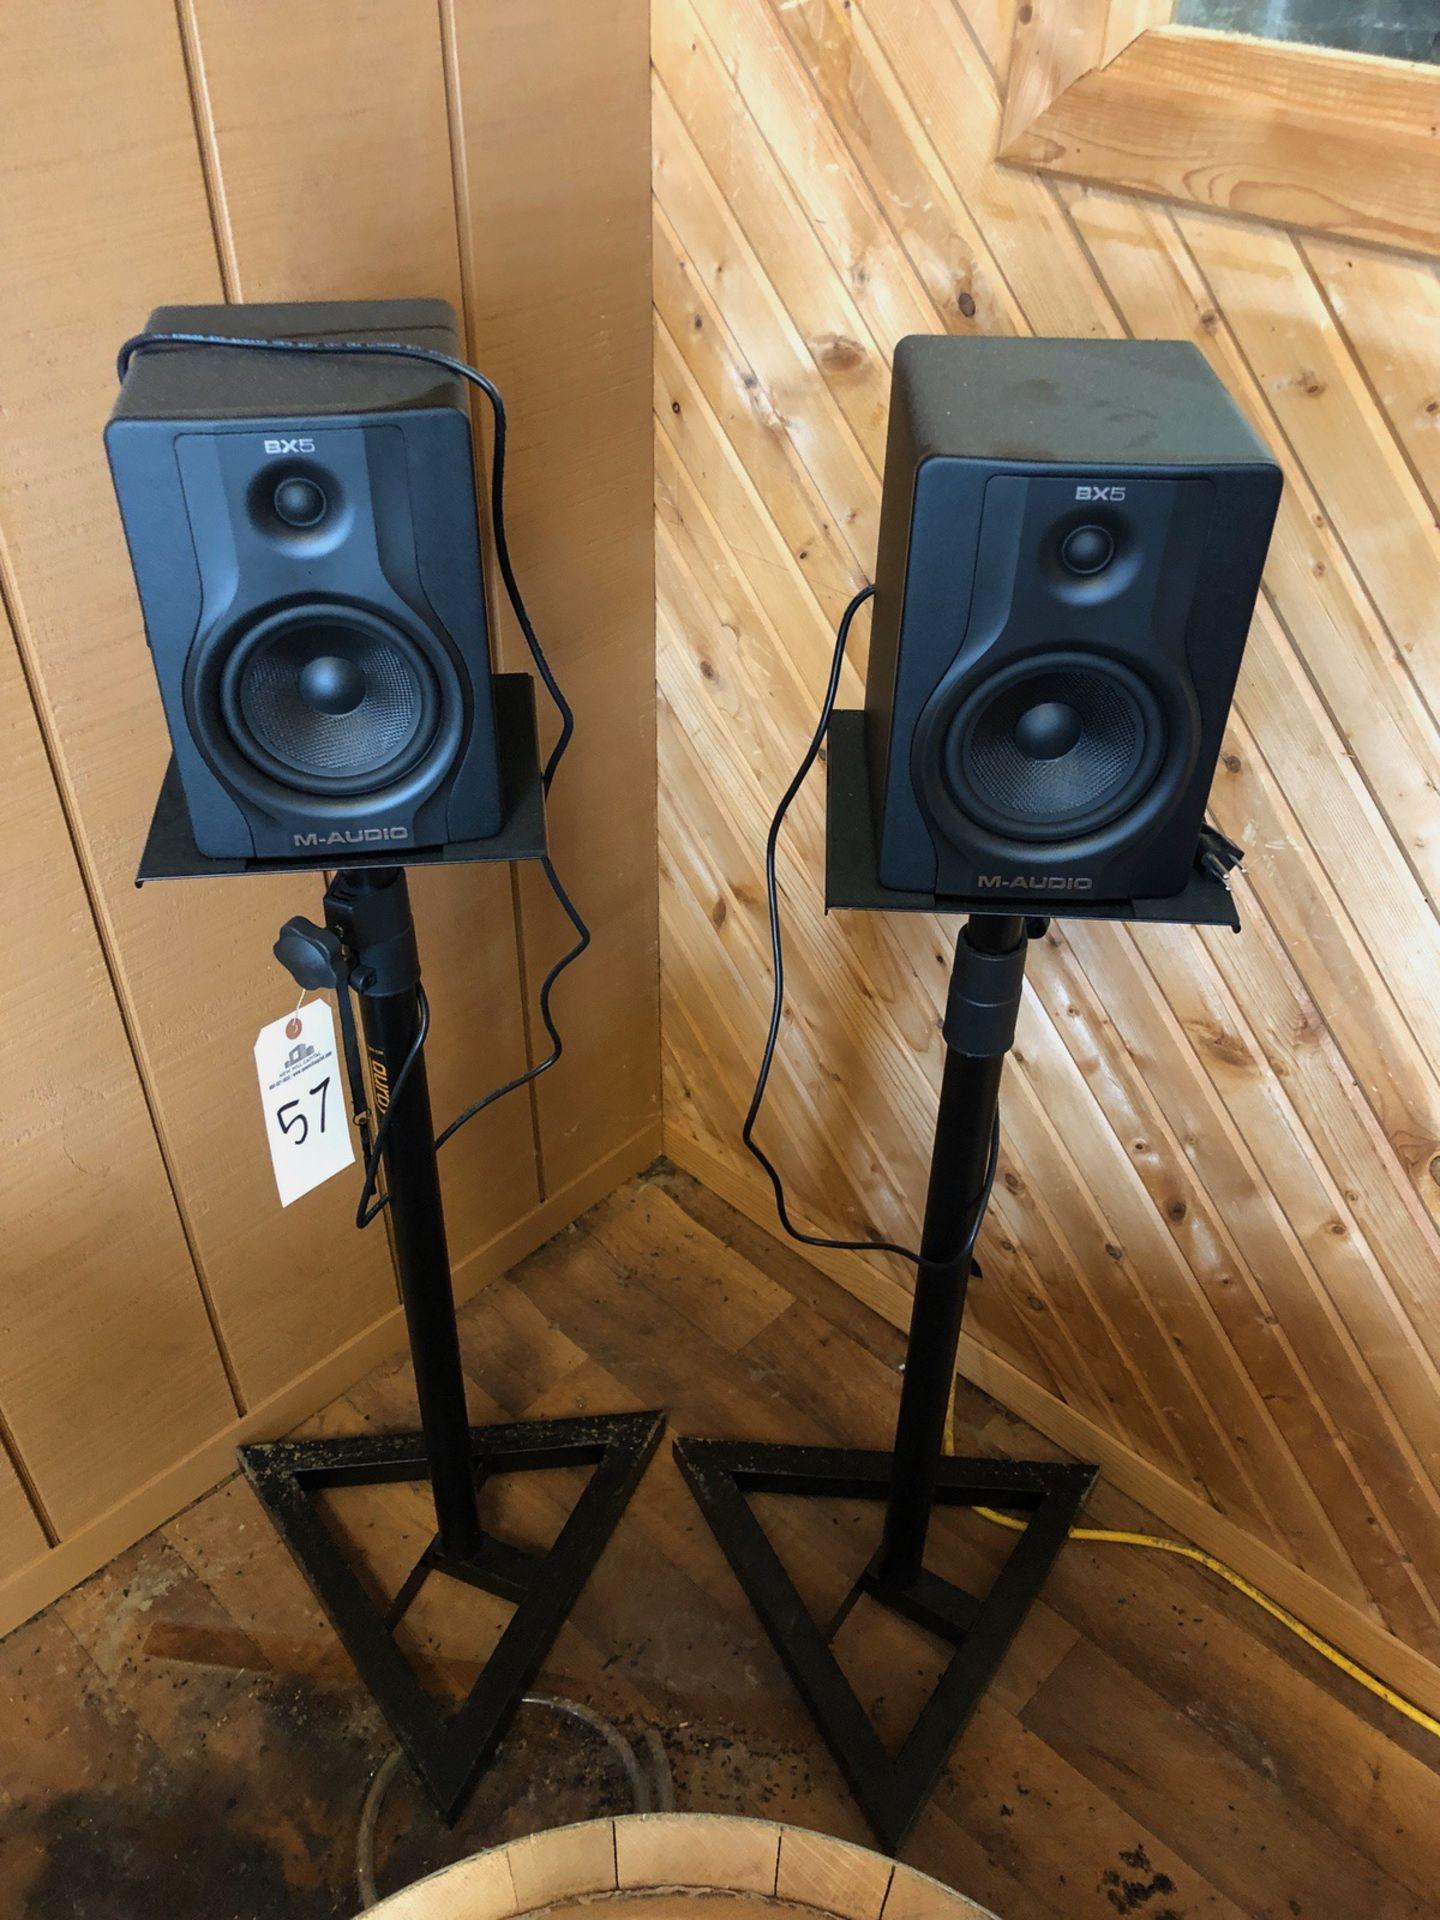 Lot 57 - (2) M-Audio Speakers | Rig Fee: $50 or HC